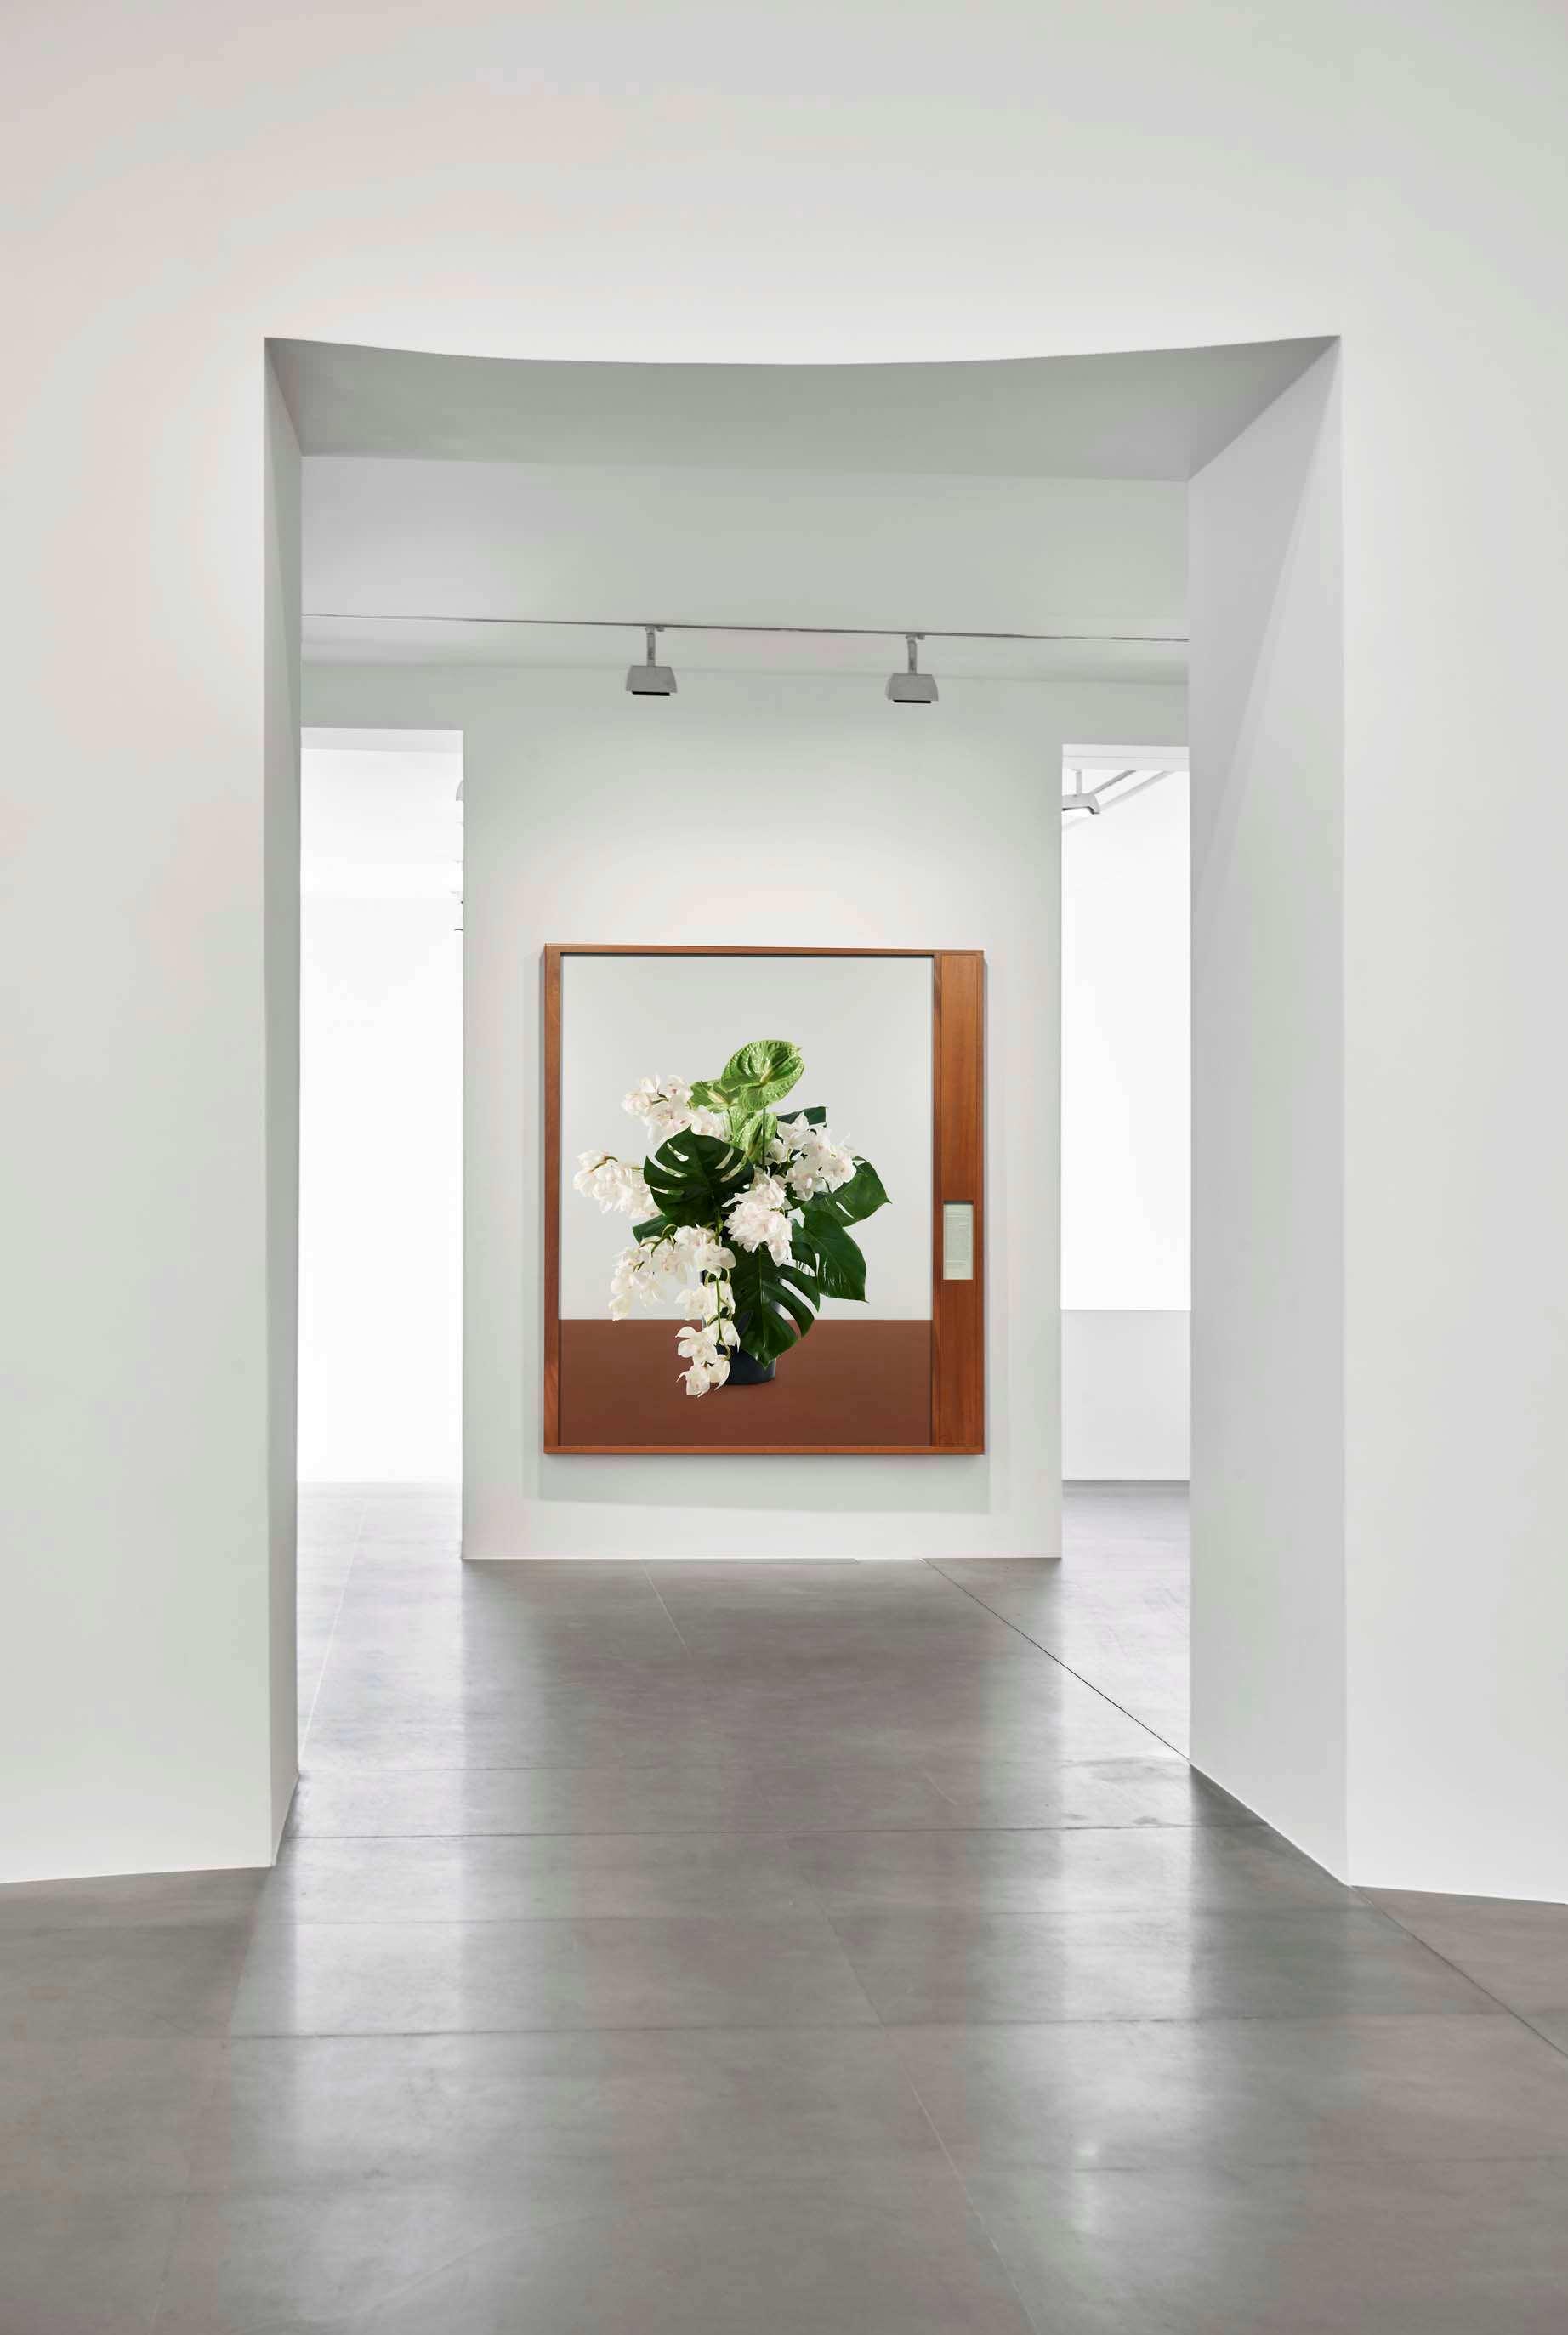 Cecily Brown Dore Ashton Lari Pittman Gagosian Gallery